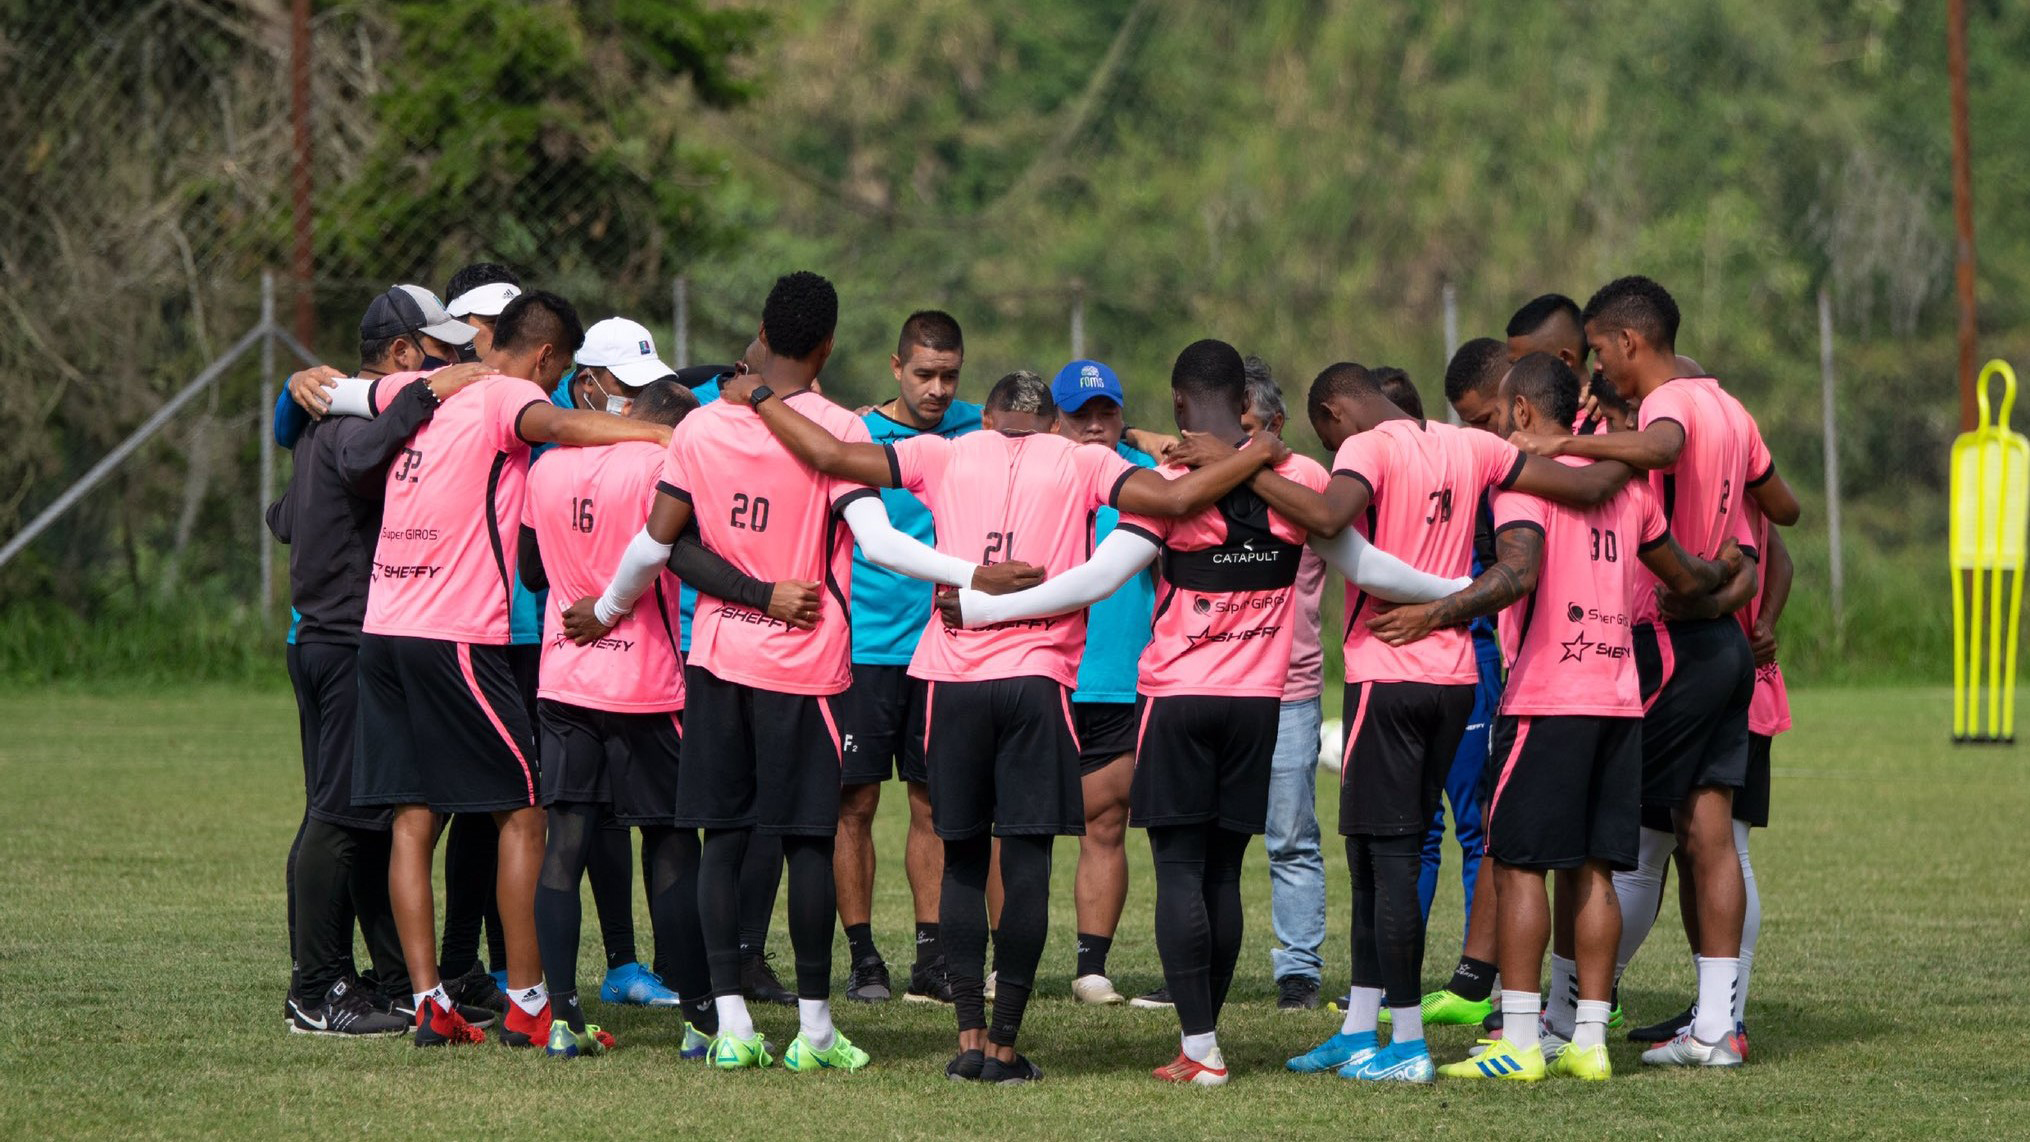 once-caldas-1-0-junior-de-barranquilla-2016-casa-blanca-oc